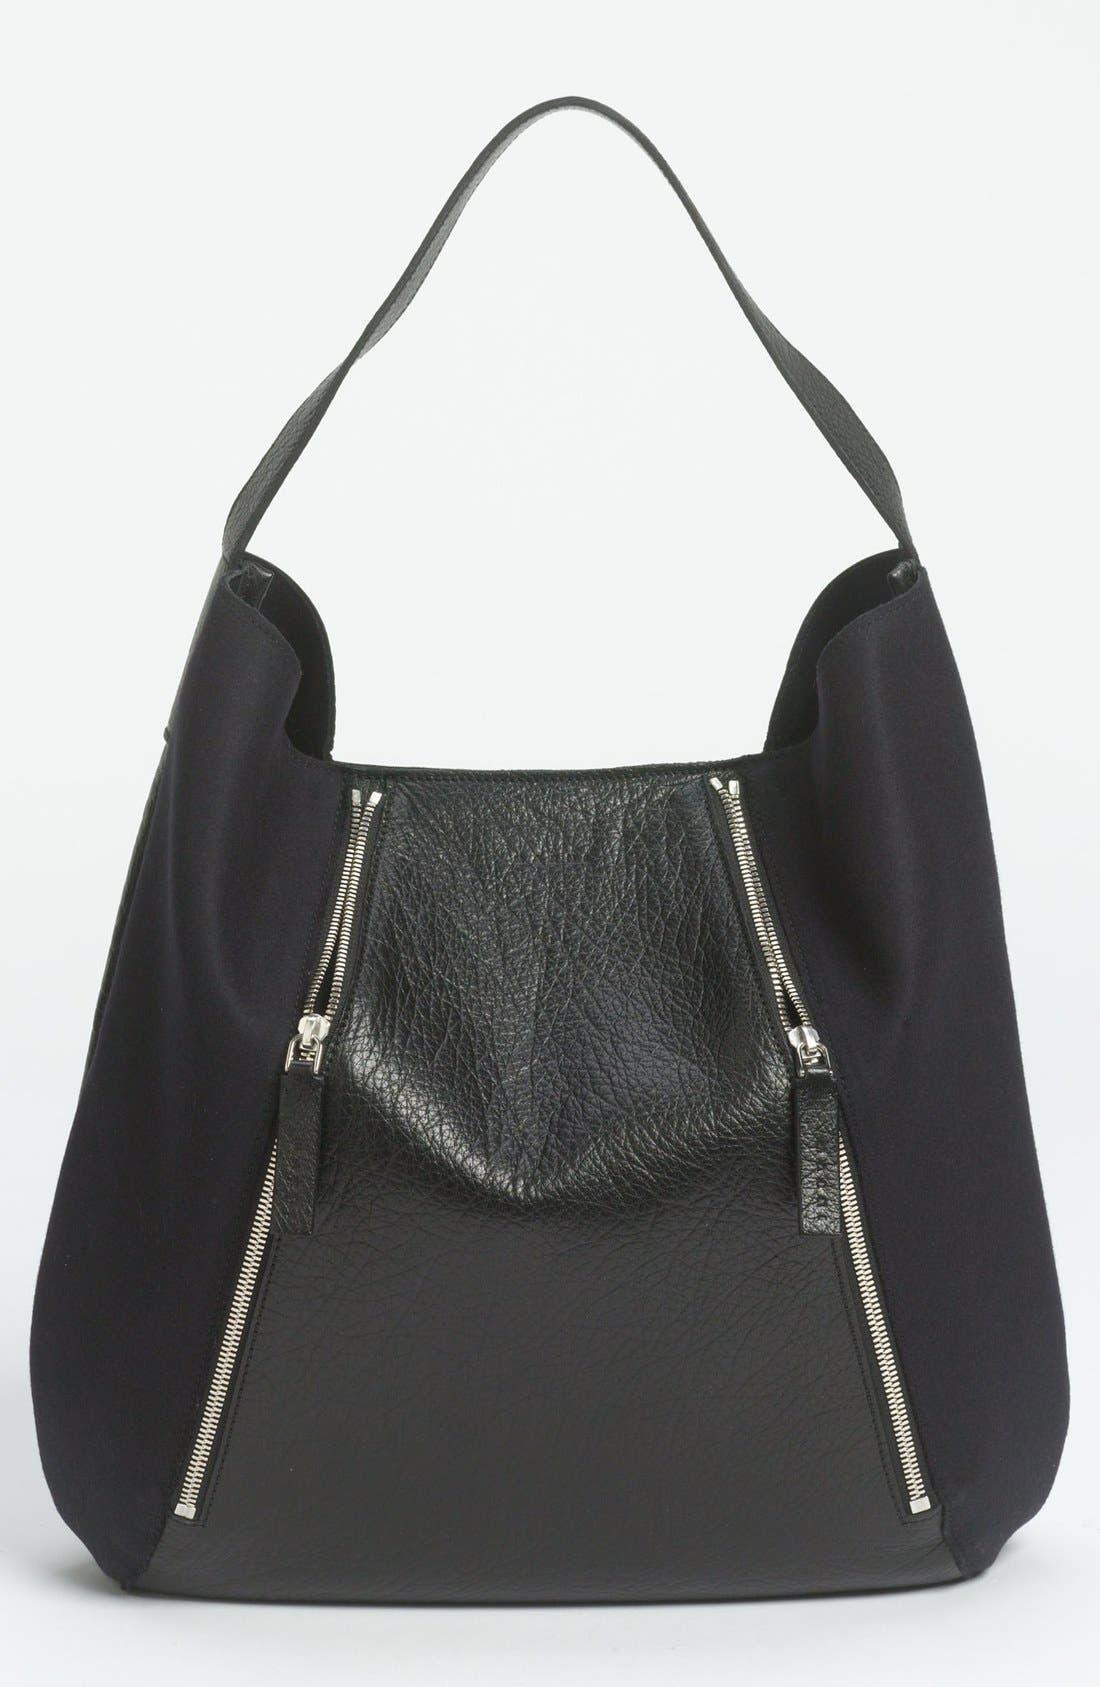 Main Image - Marni Bicolor Leather & Fabric Hobo